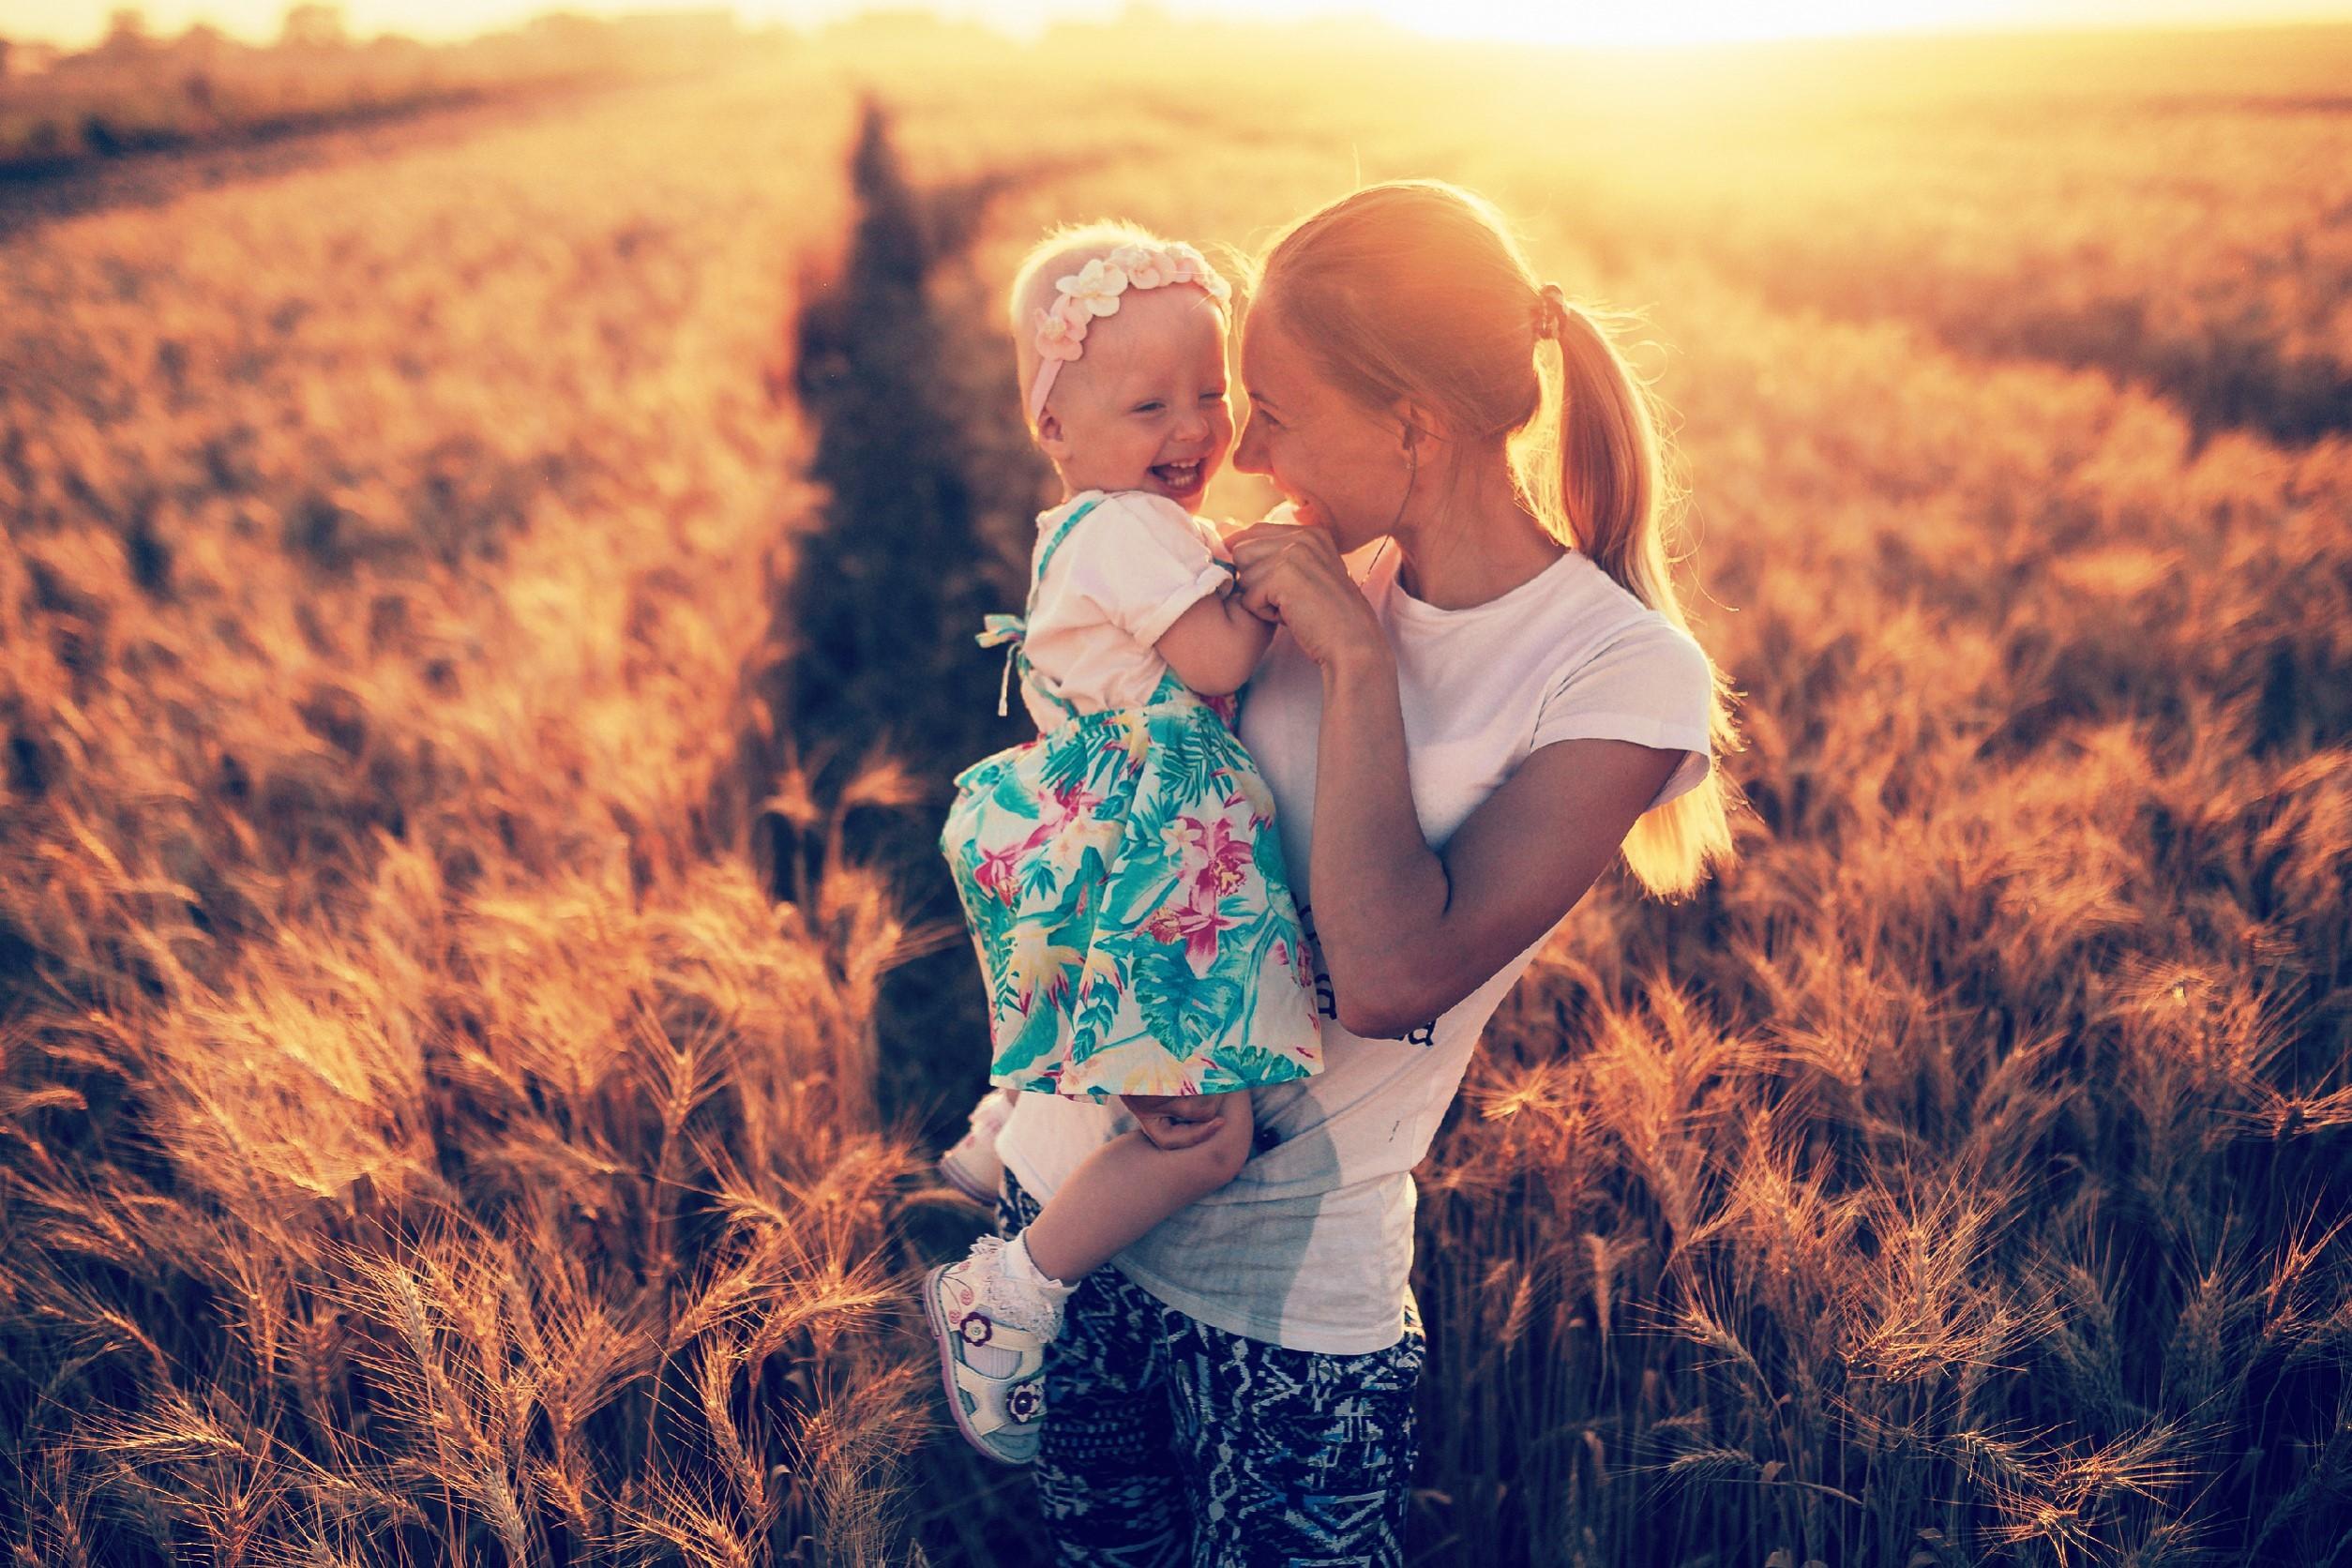 La Culpa en la maternidad